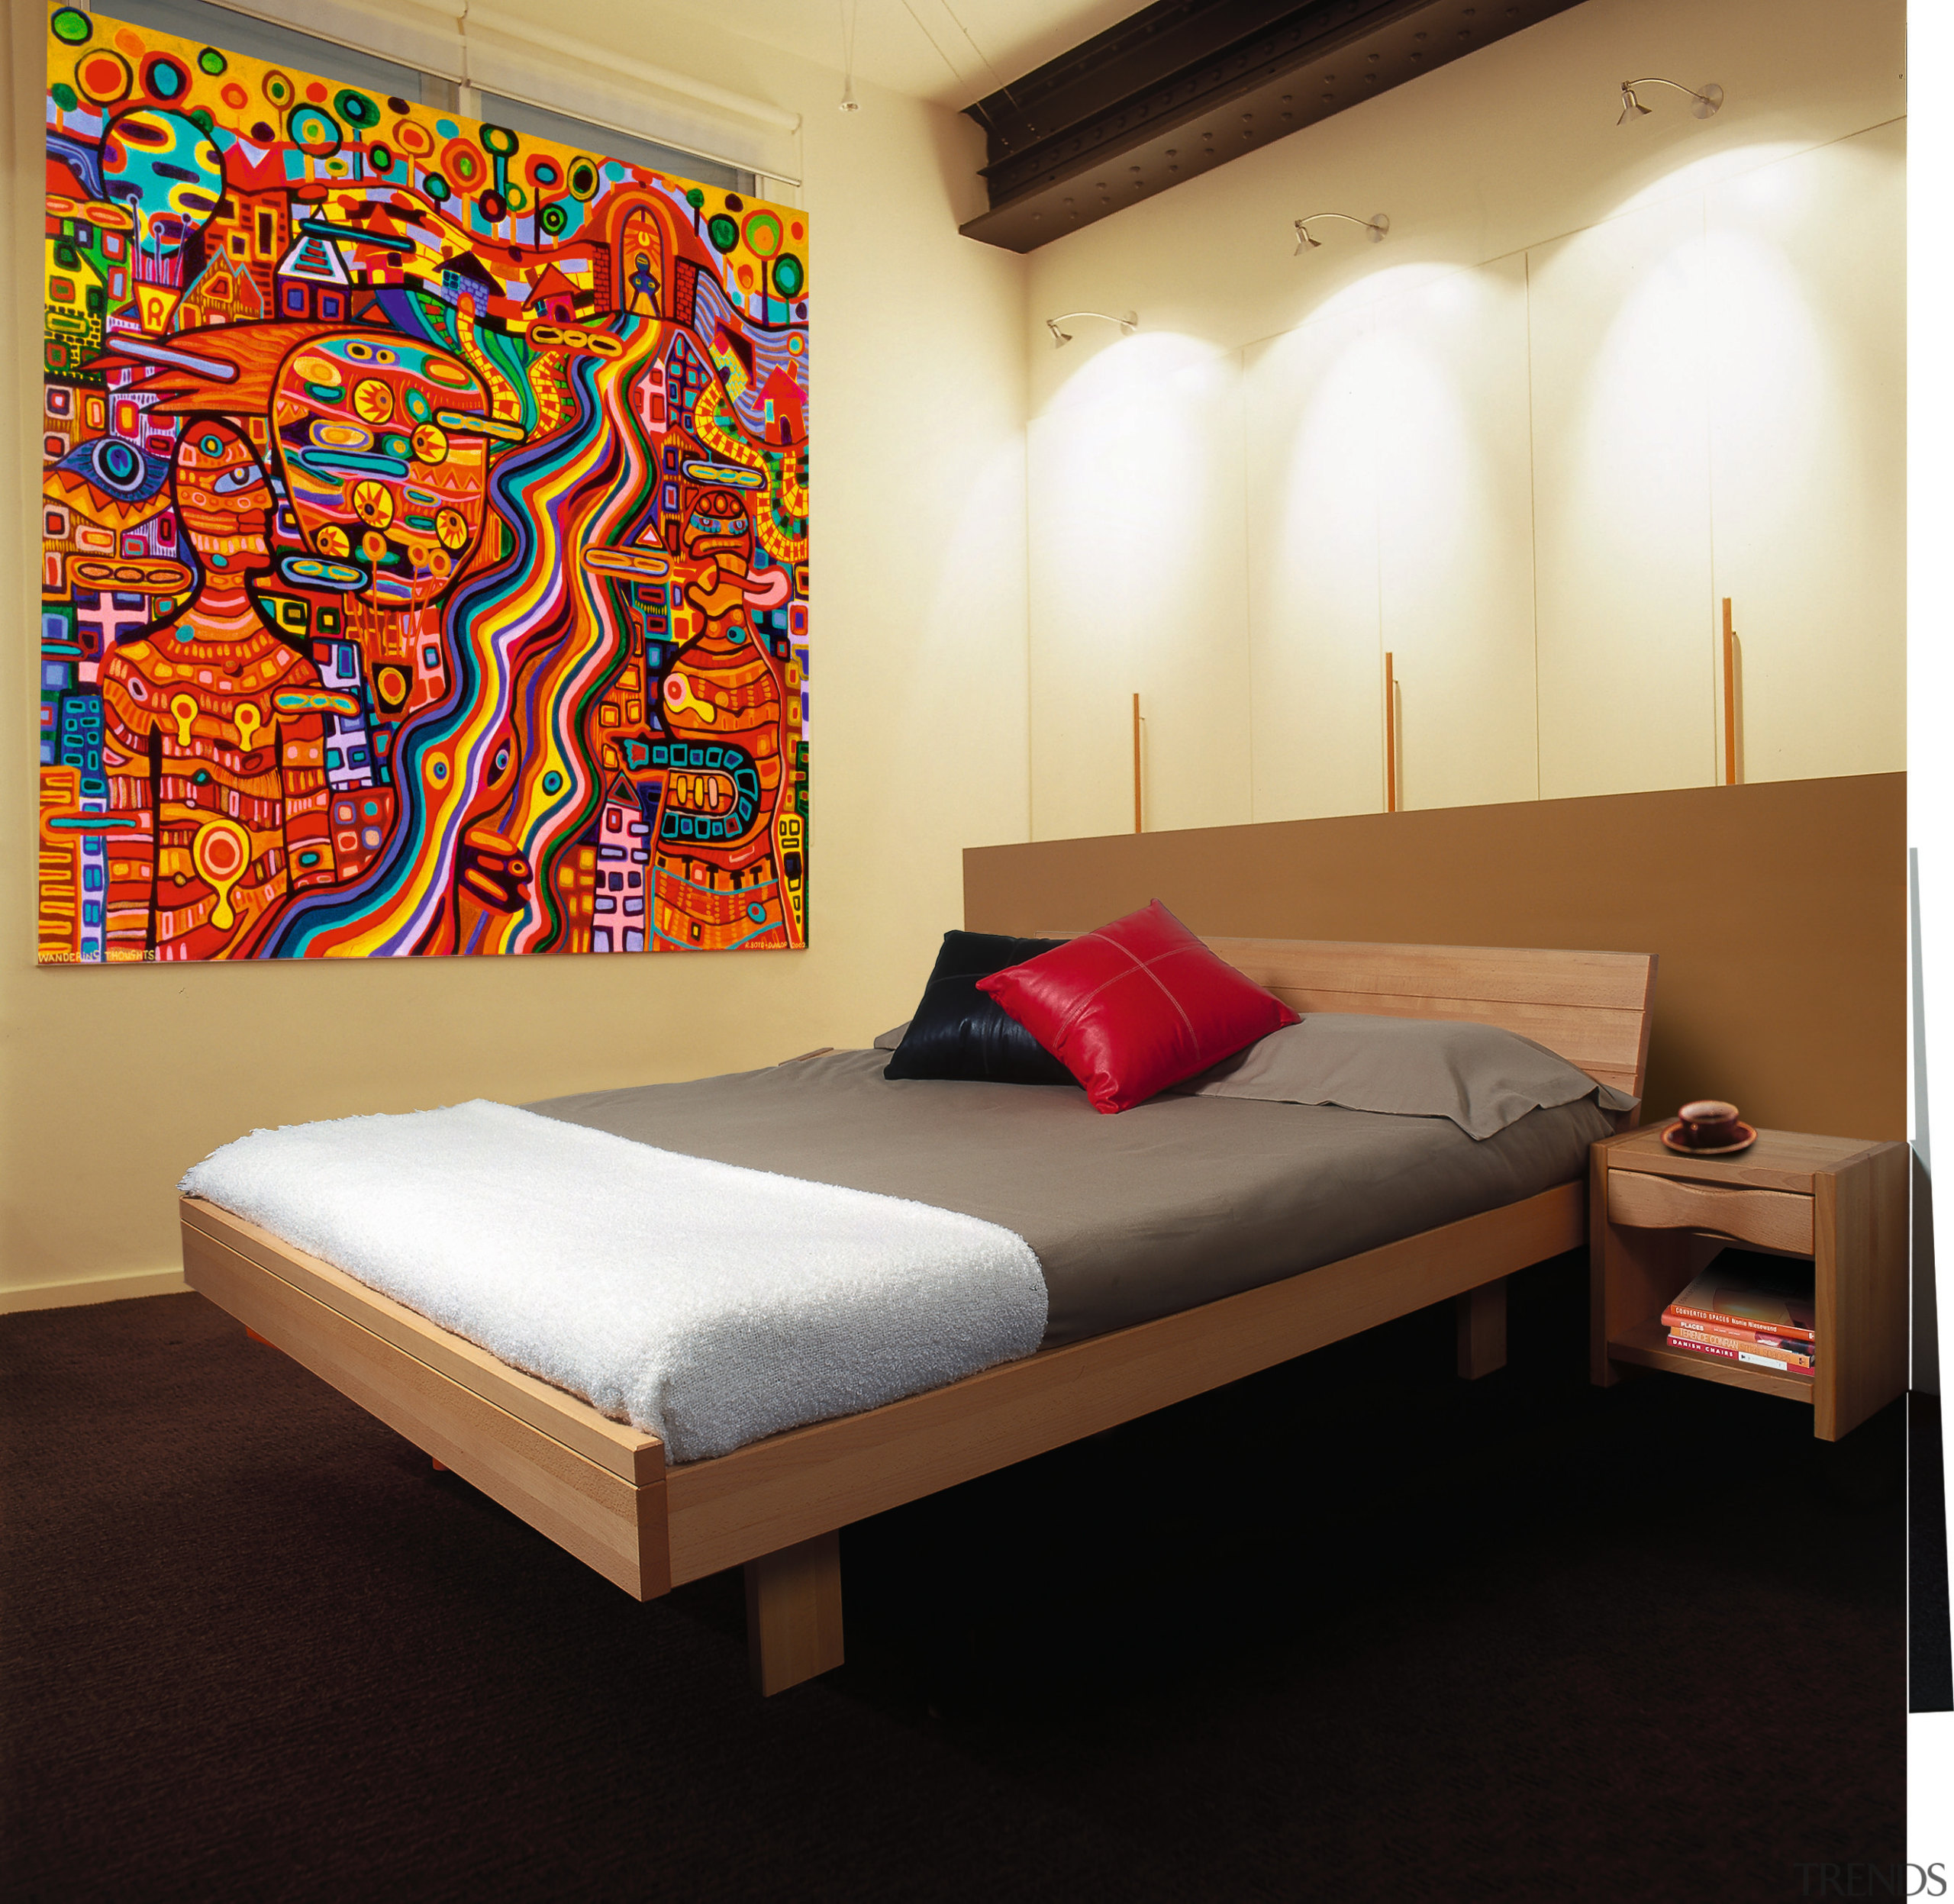 A bedroom with a Huesler nest bed with bed, bed frame, bed sheet, bedroom, ceiling, furniture, interior design, modern art, room, wall, black